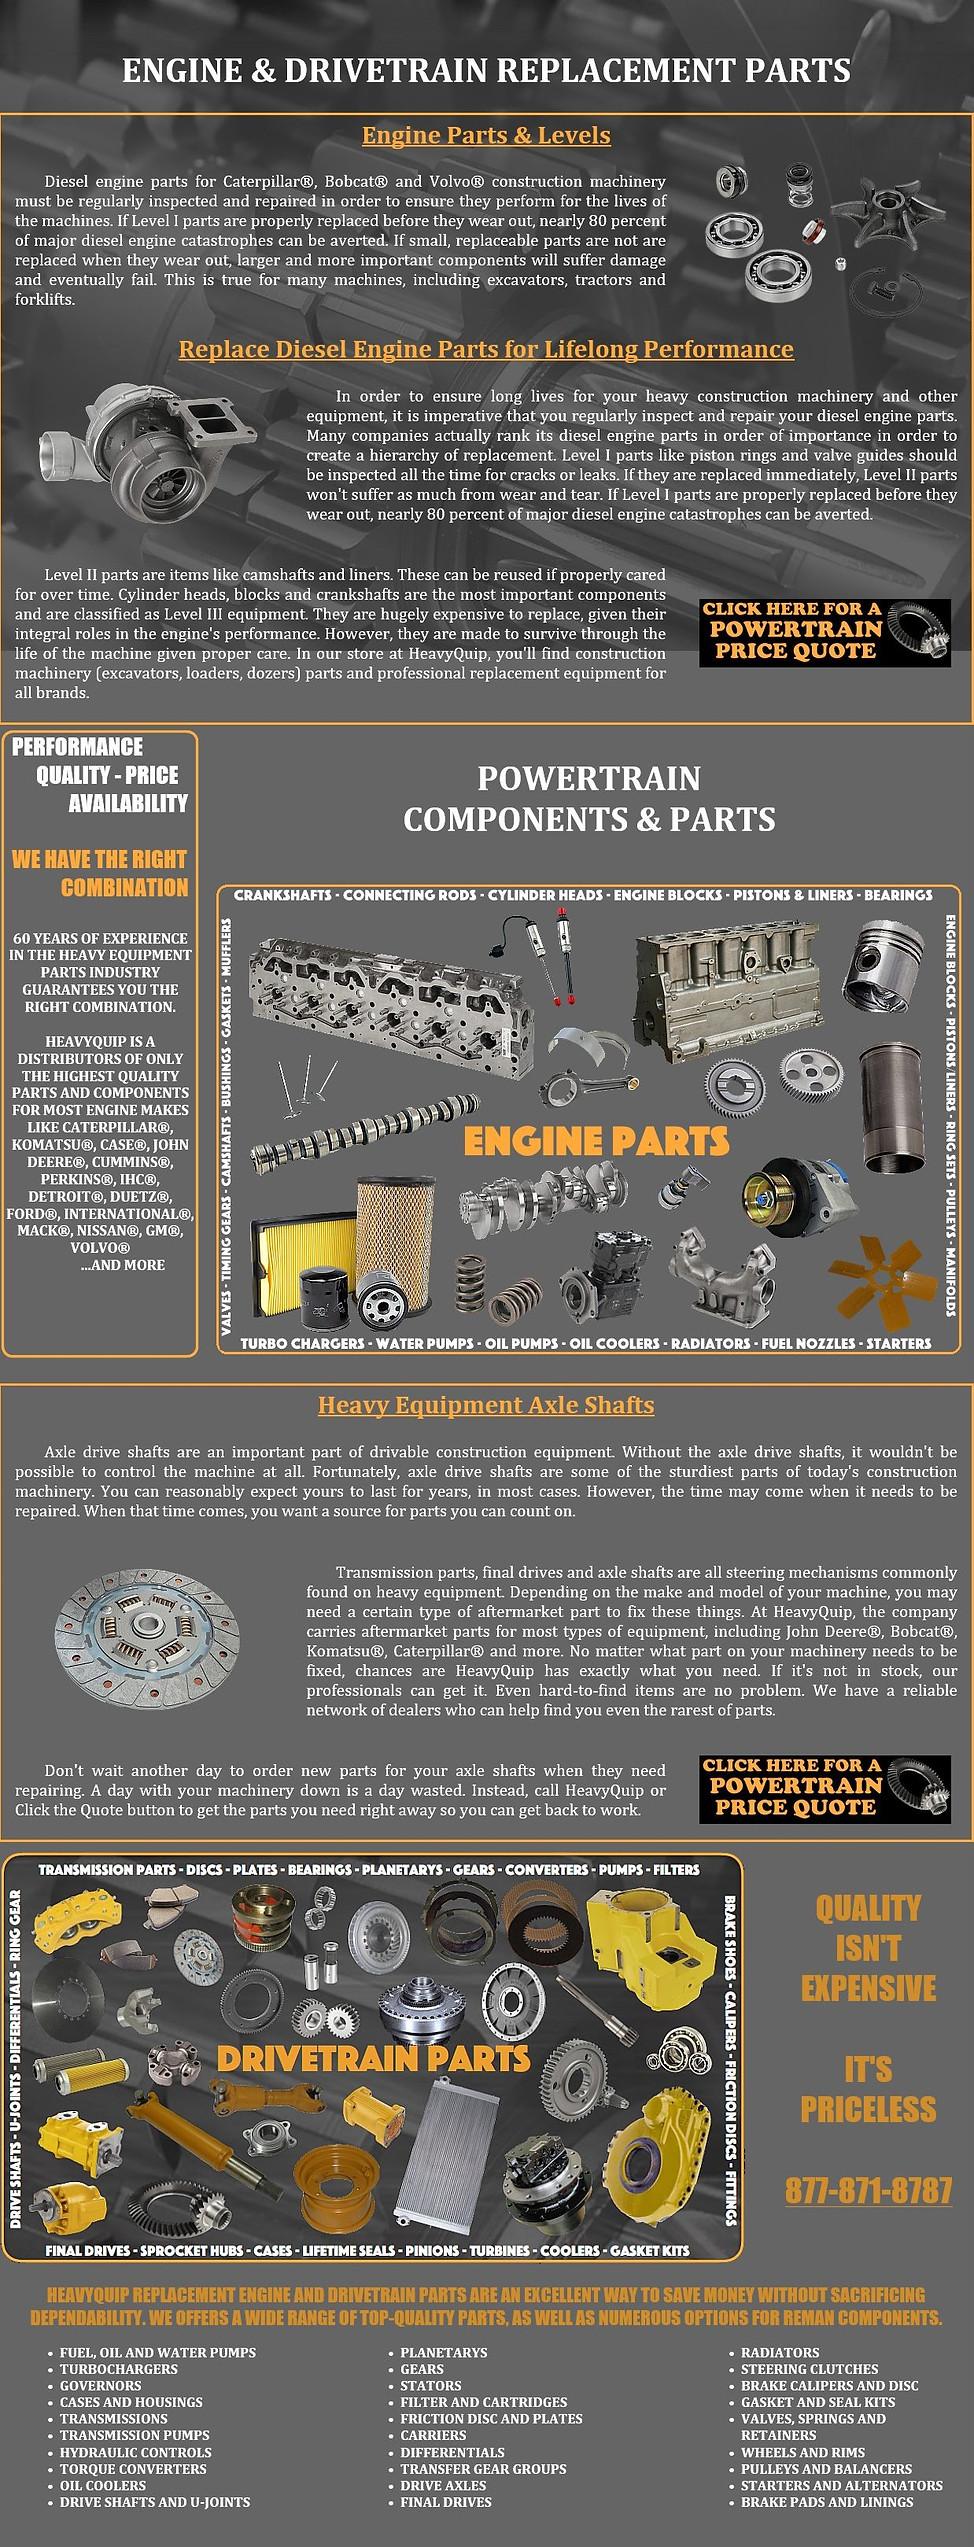 Powertrain Parts big.jpg